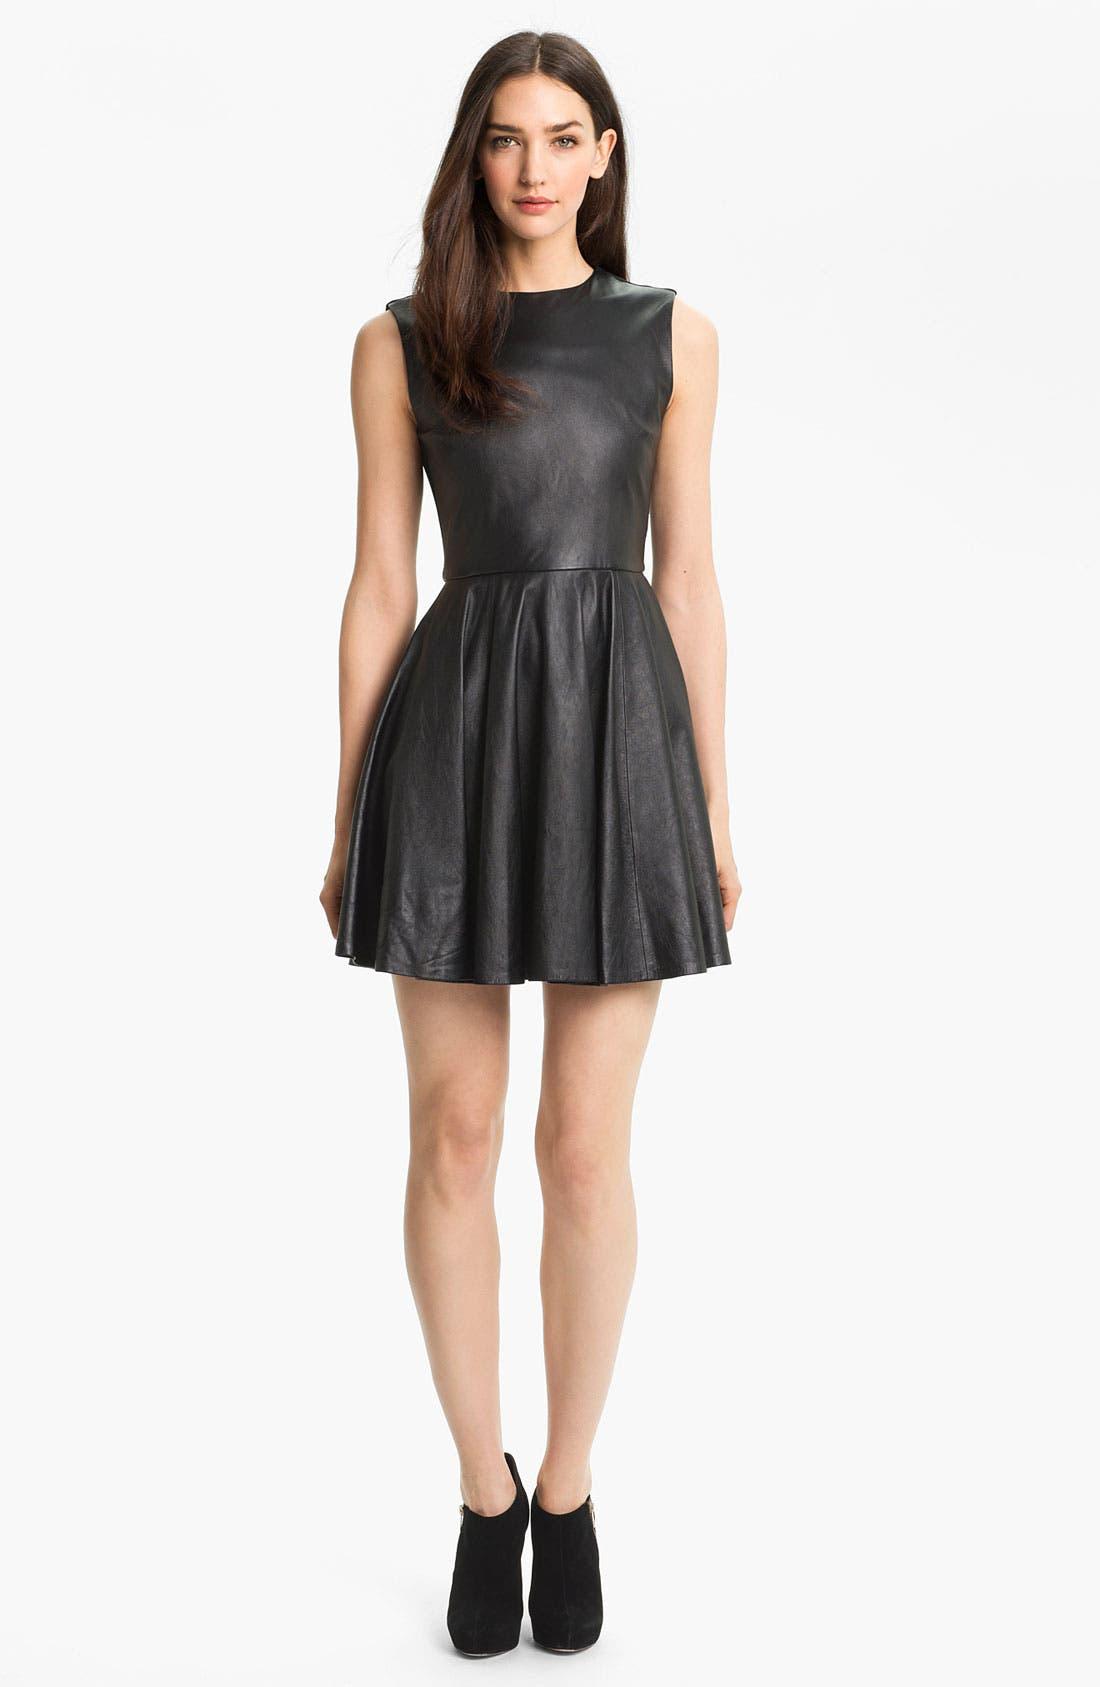 Alternate Image 1 Selected - Diane von Furstenberg 'Jeannie' Leather Fit & Flare Dress